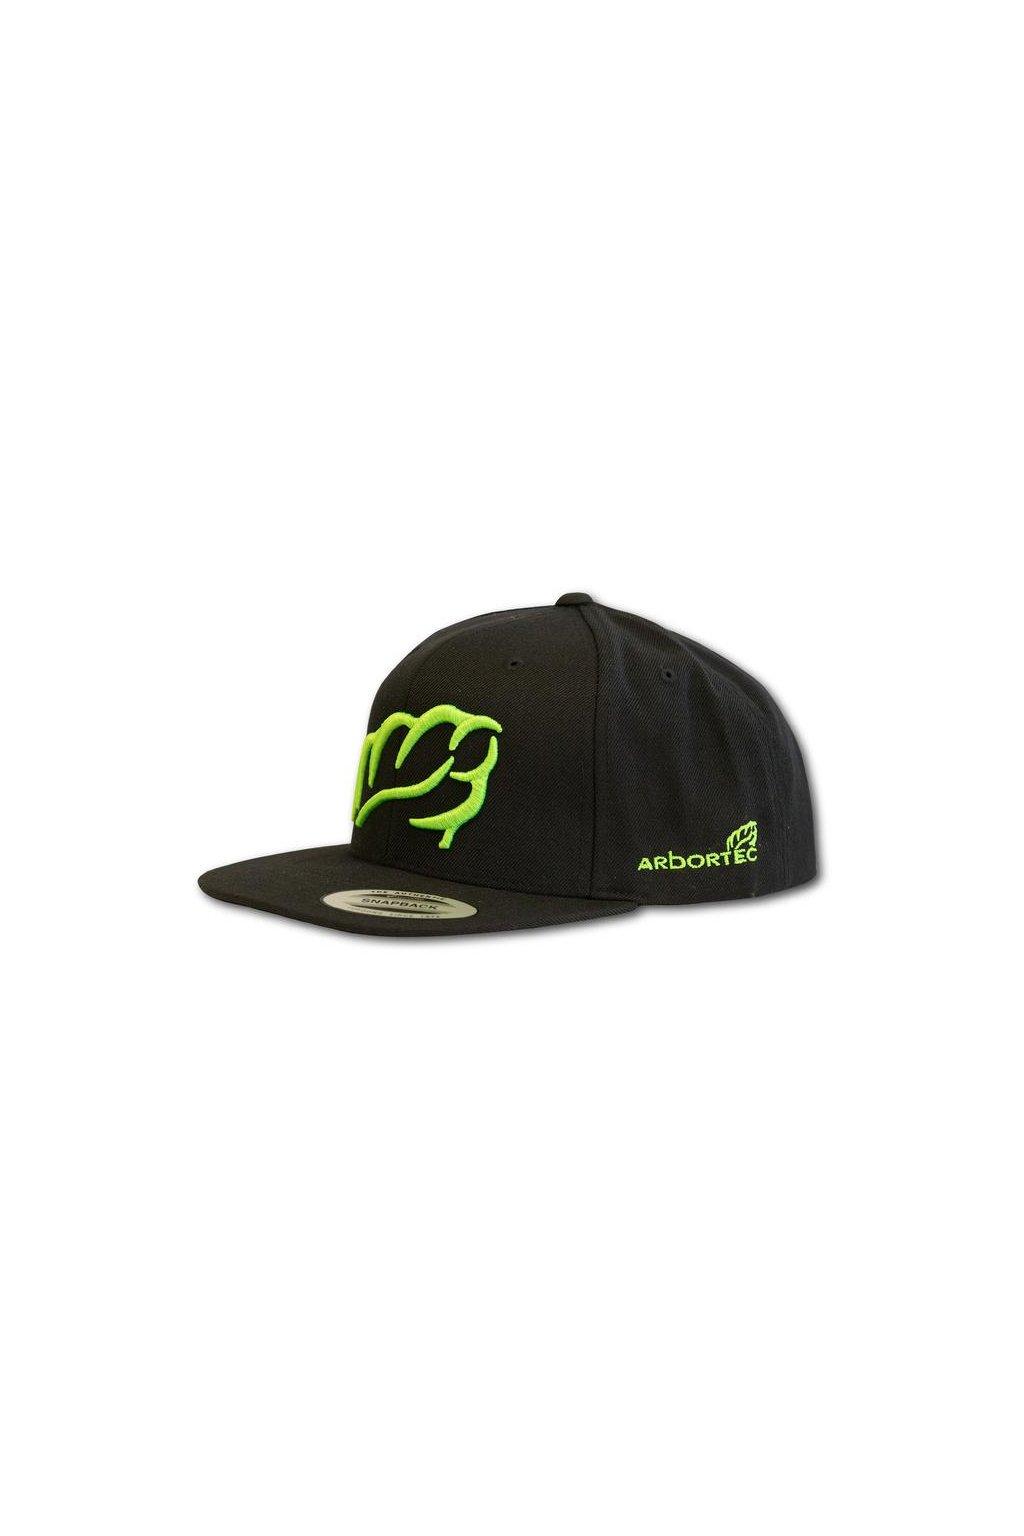 Cap Black Lime 720x